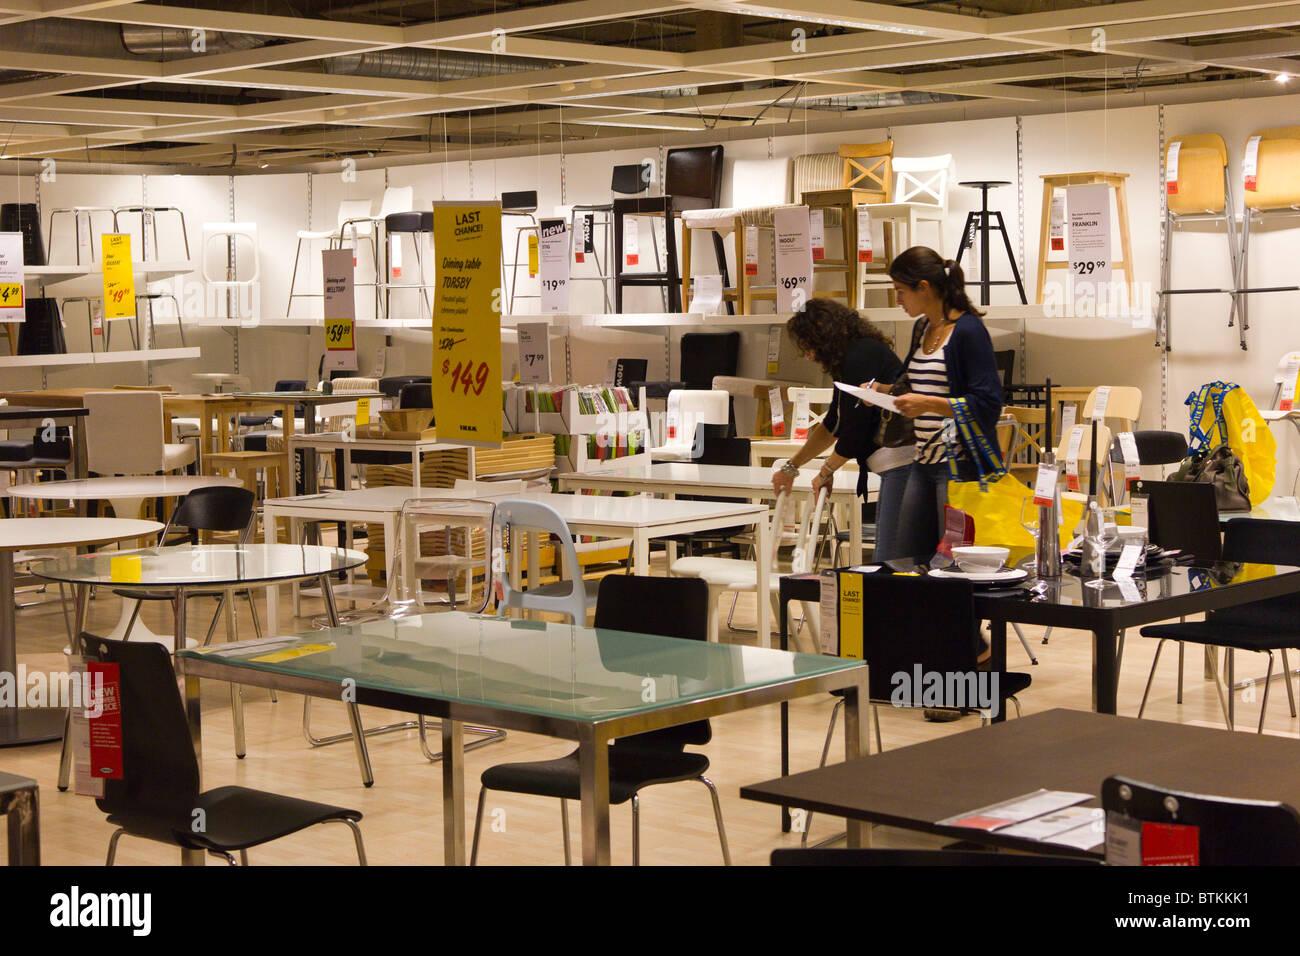 Ikea Furniture Warehouse Store Plymouth Meeting Pennsylvania Usa Stock Photo Royalty Free